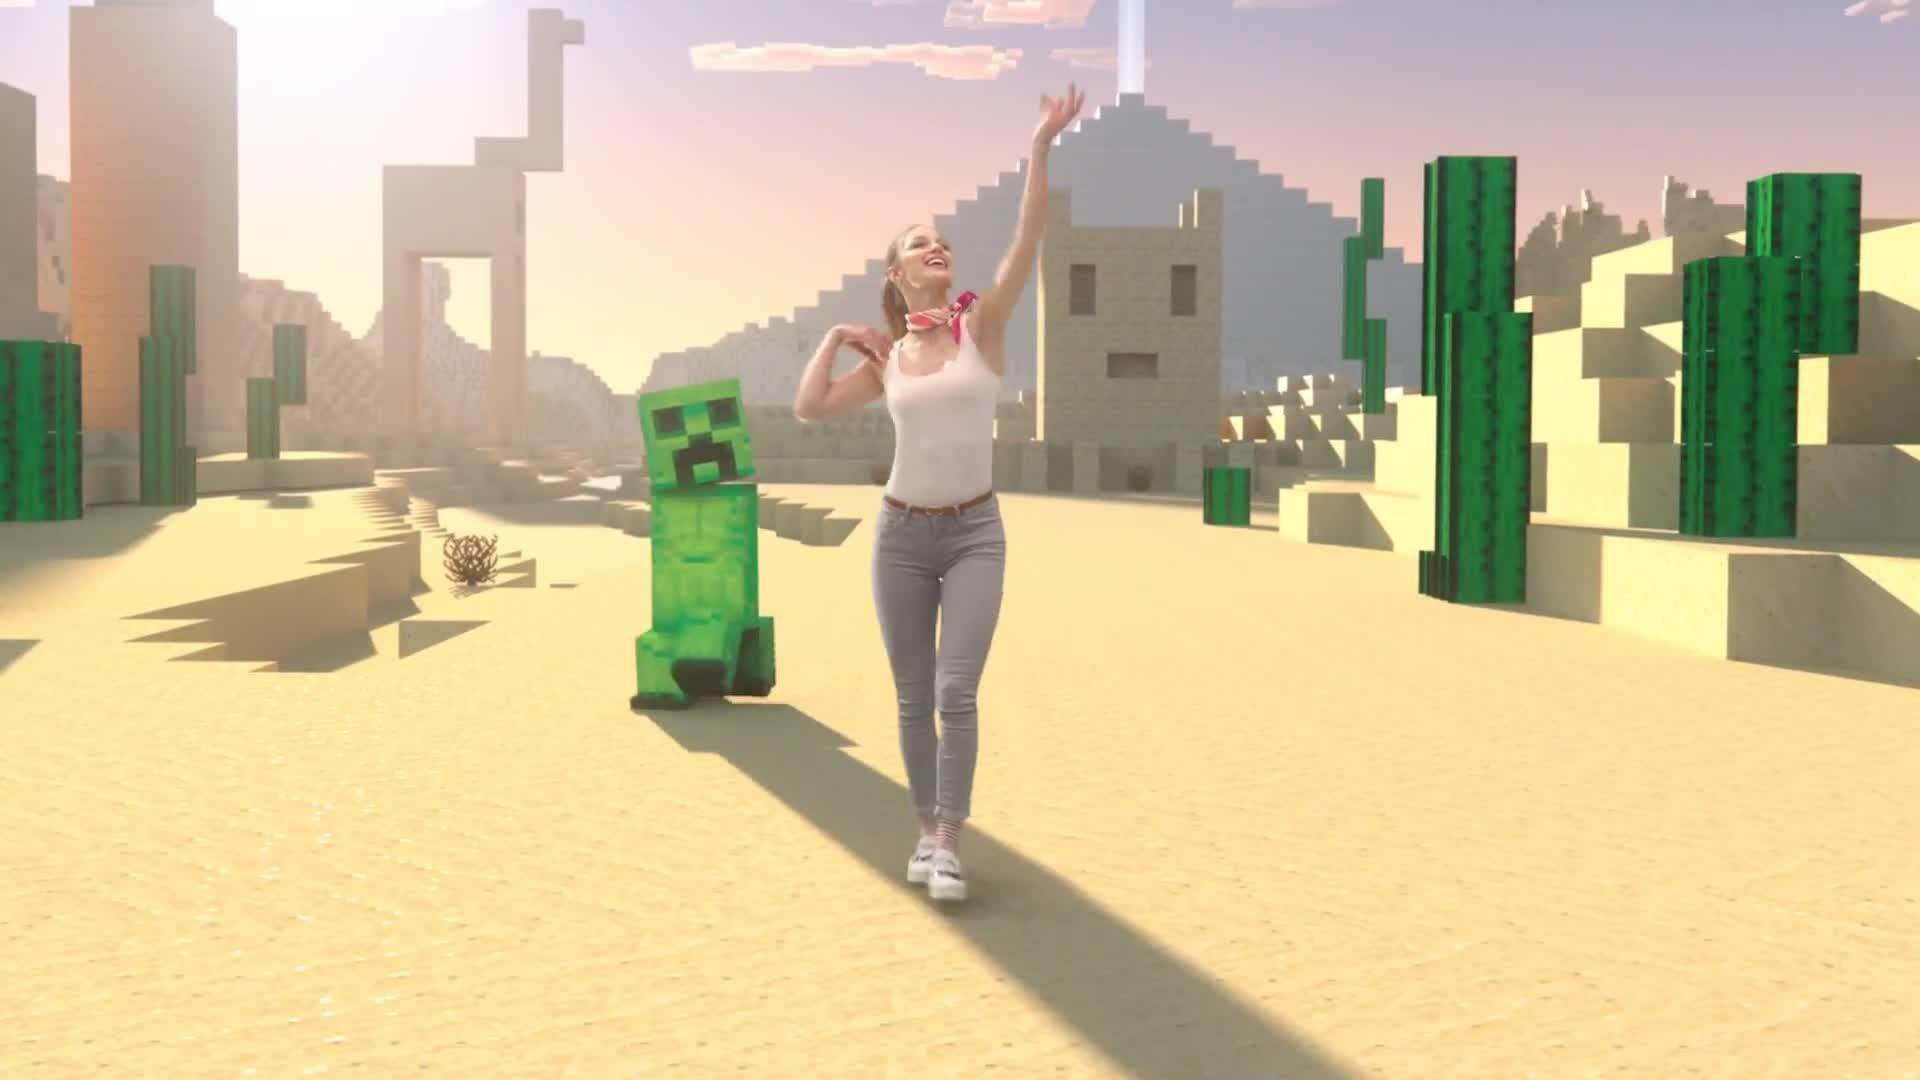 Minecraft Super Duper - Musical trailer | Feed4gamers